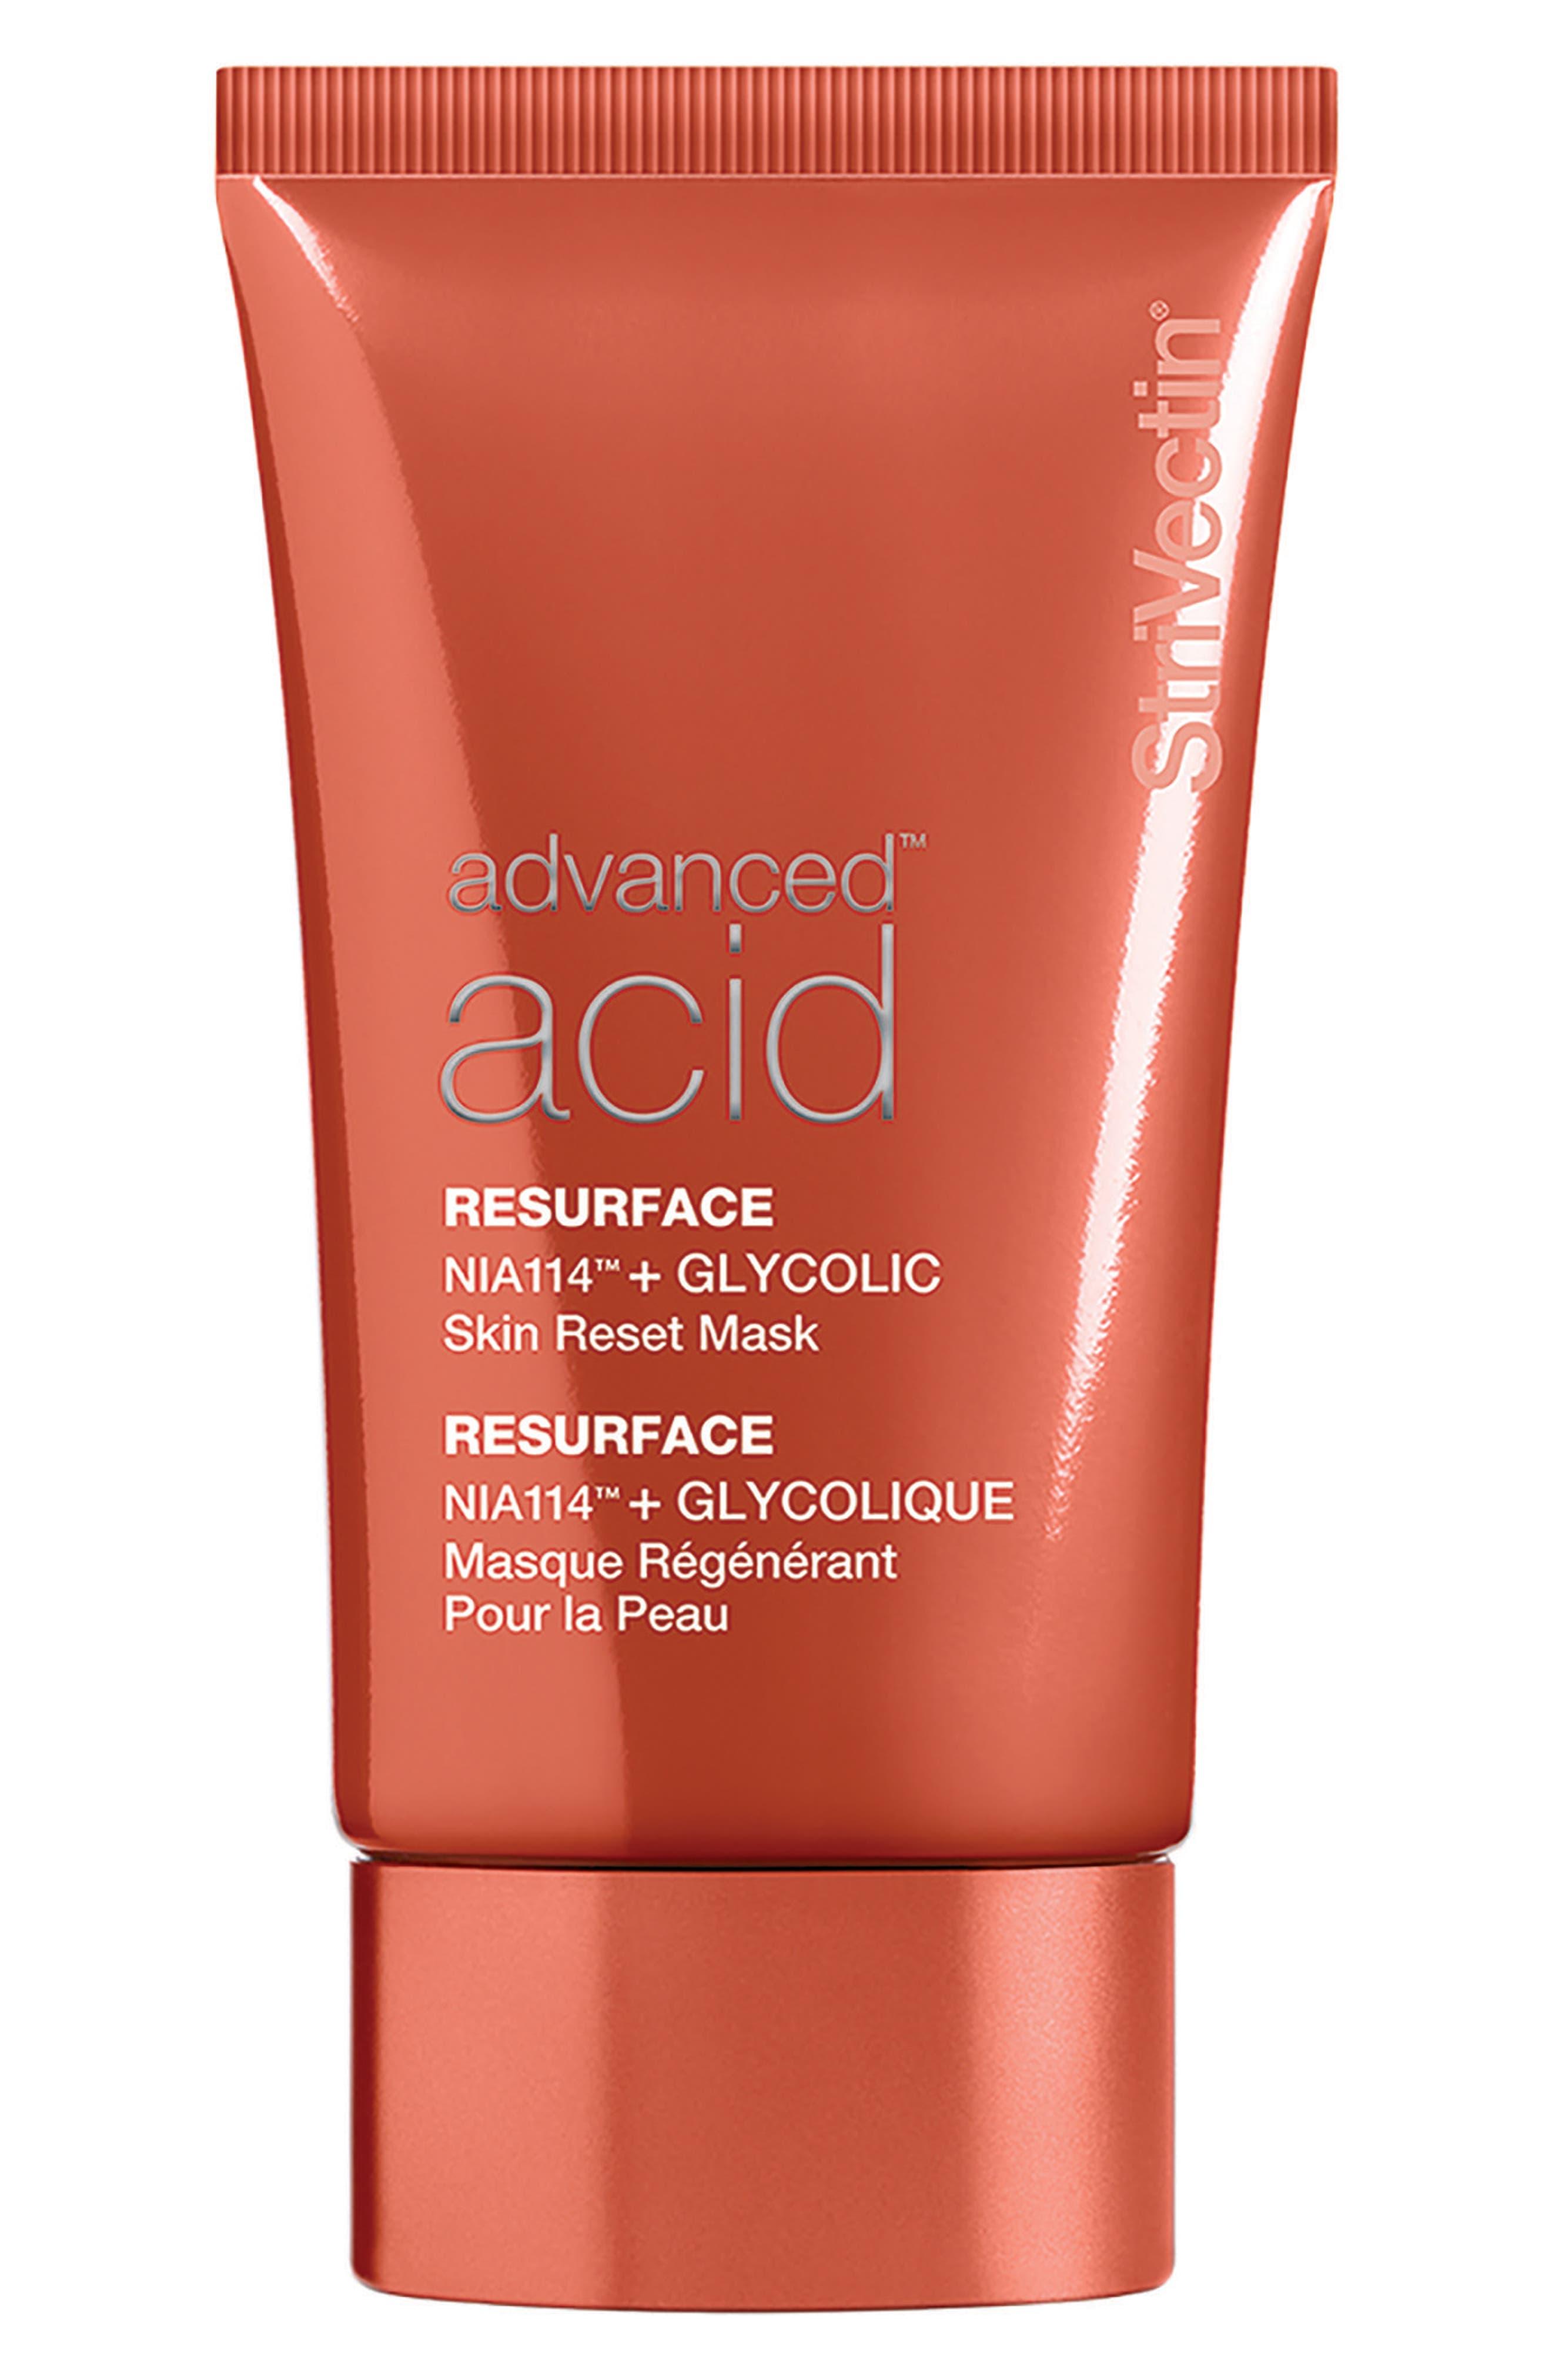 StriVectin® Advanced Acid Resurface Glycolic Acid Skin Reset Mask